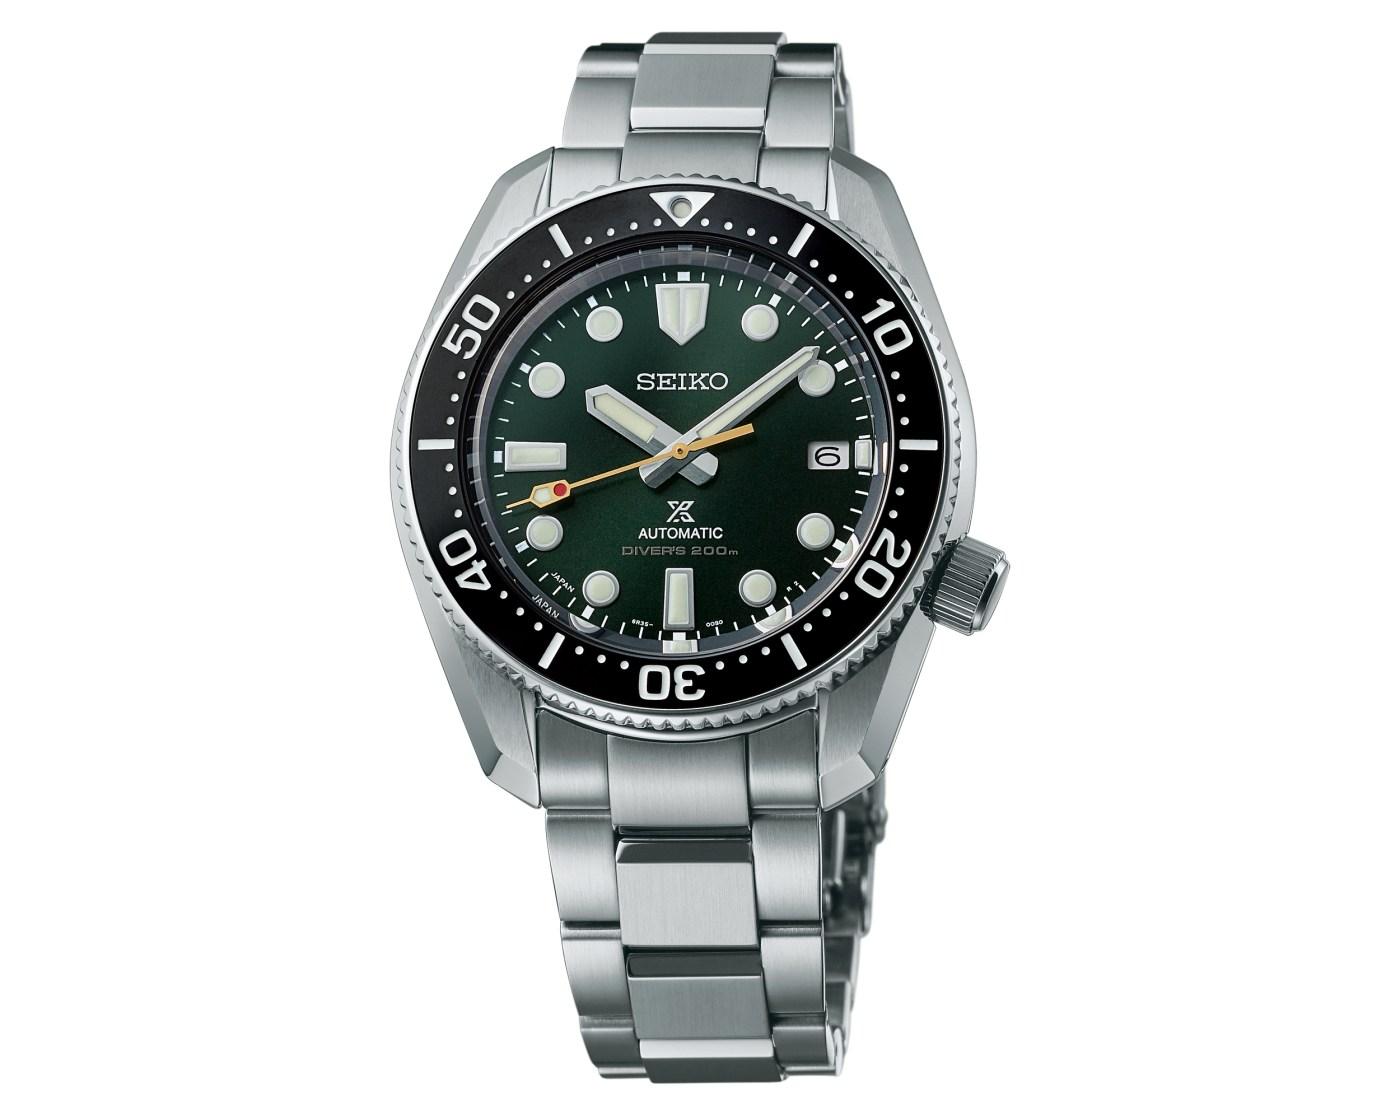 Prospex 1968 Automatic Diver's Modern Re-interpretation: SPB207